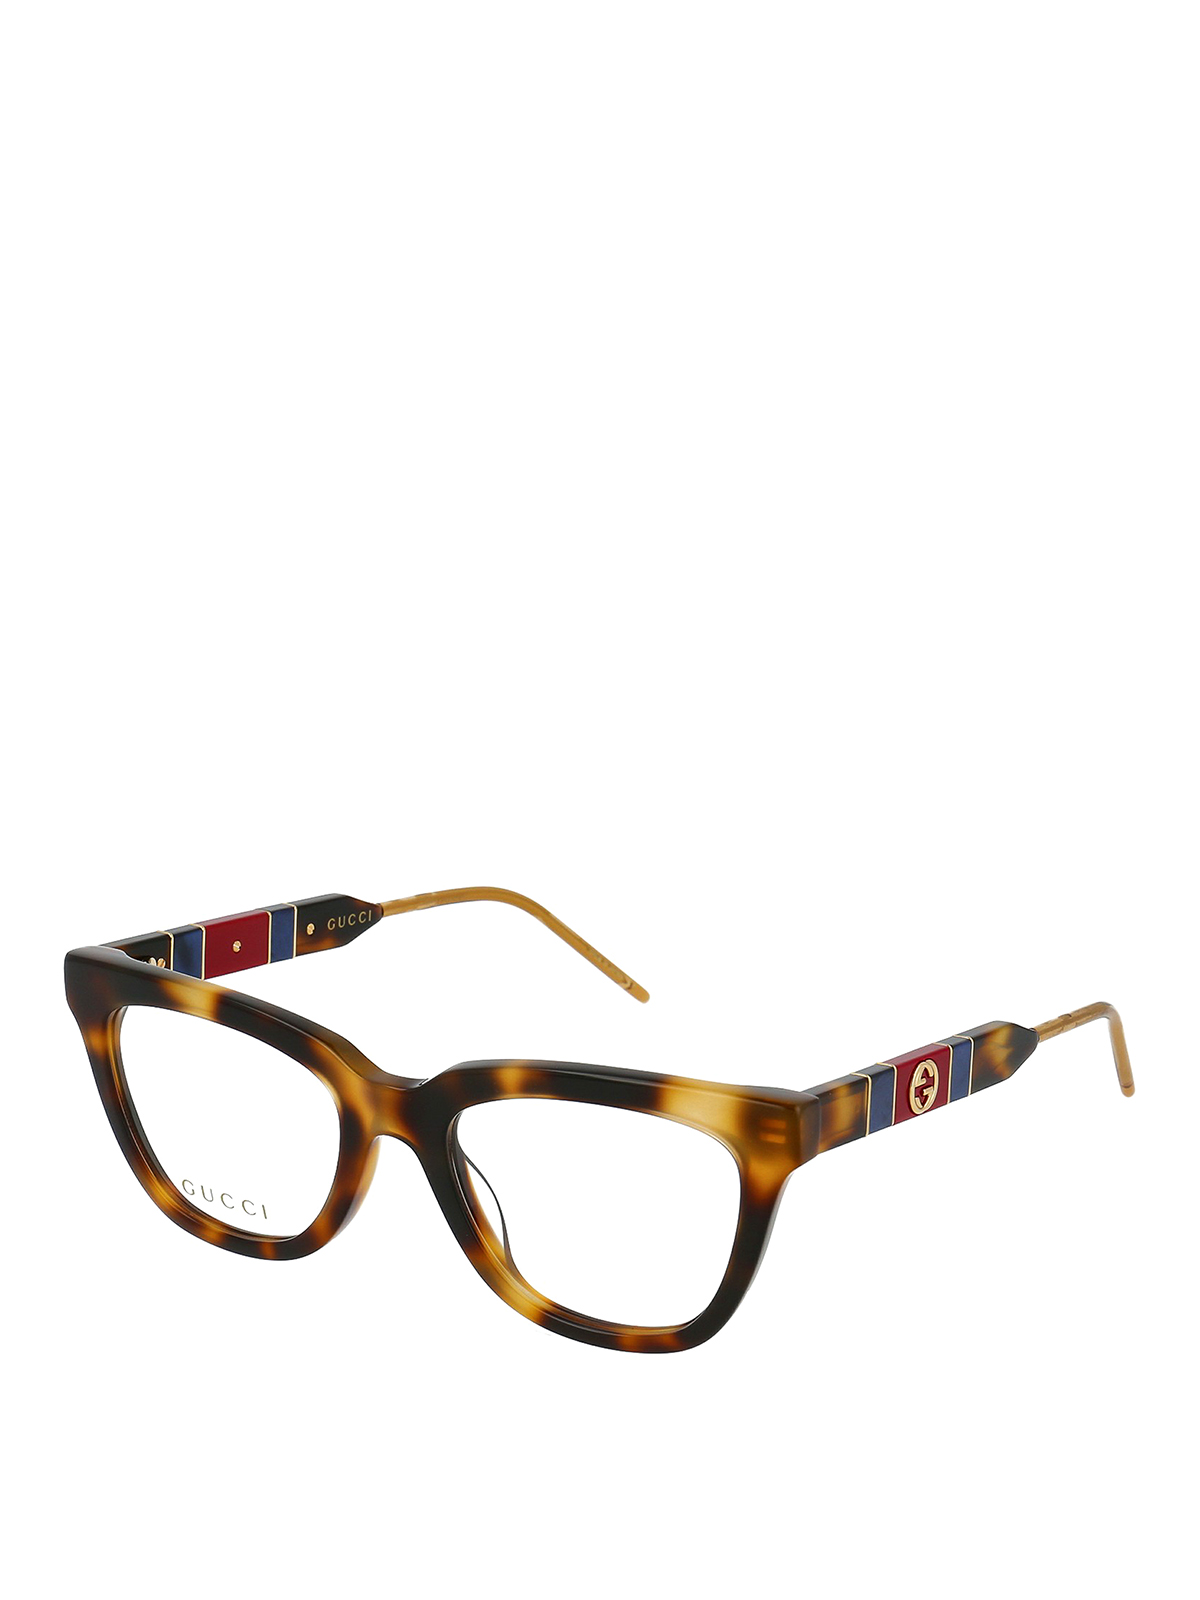 Gucci Gg Logo Havana Optical Glasses In Brown